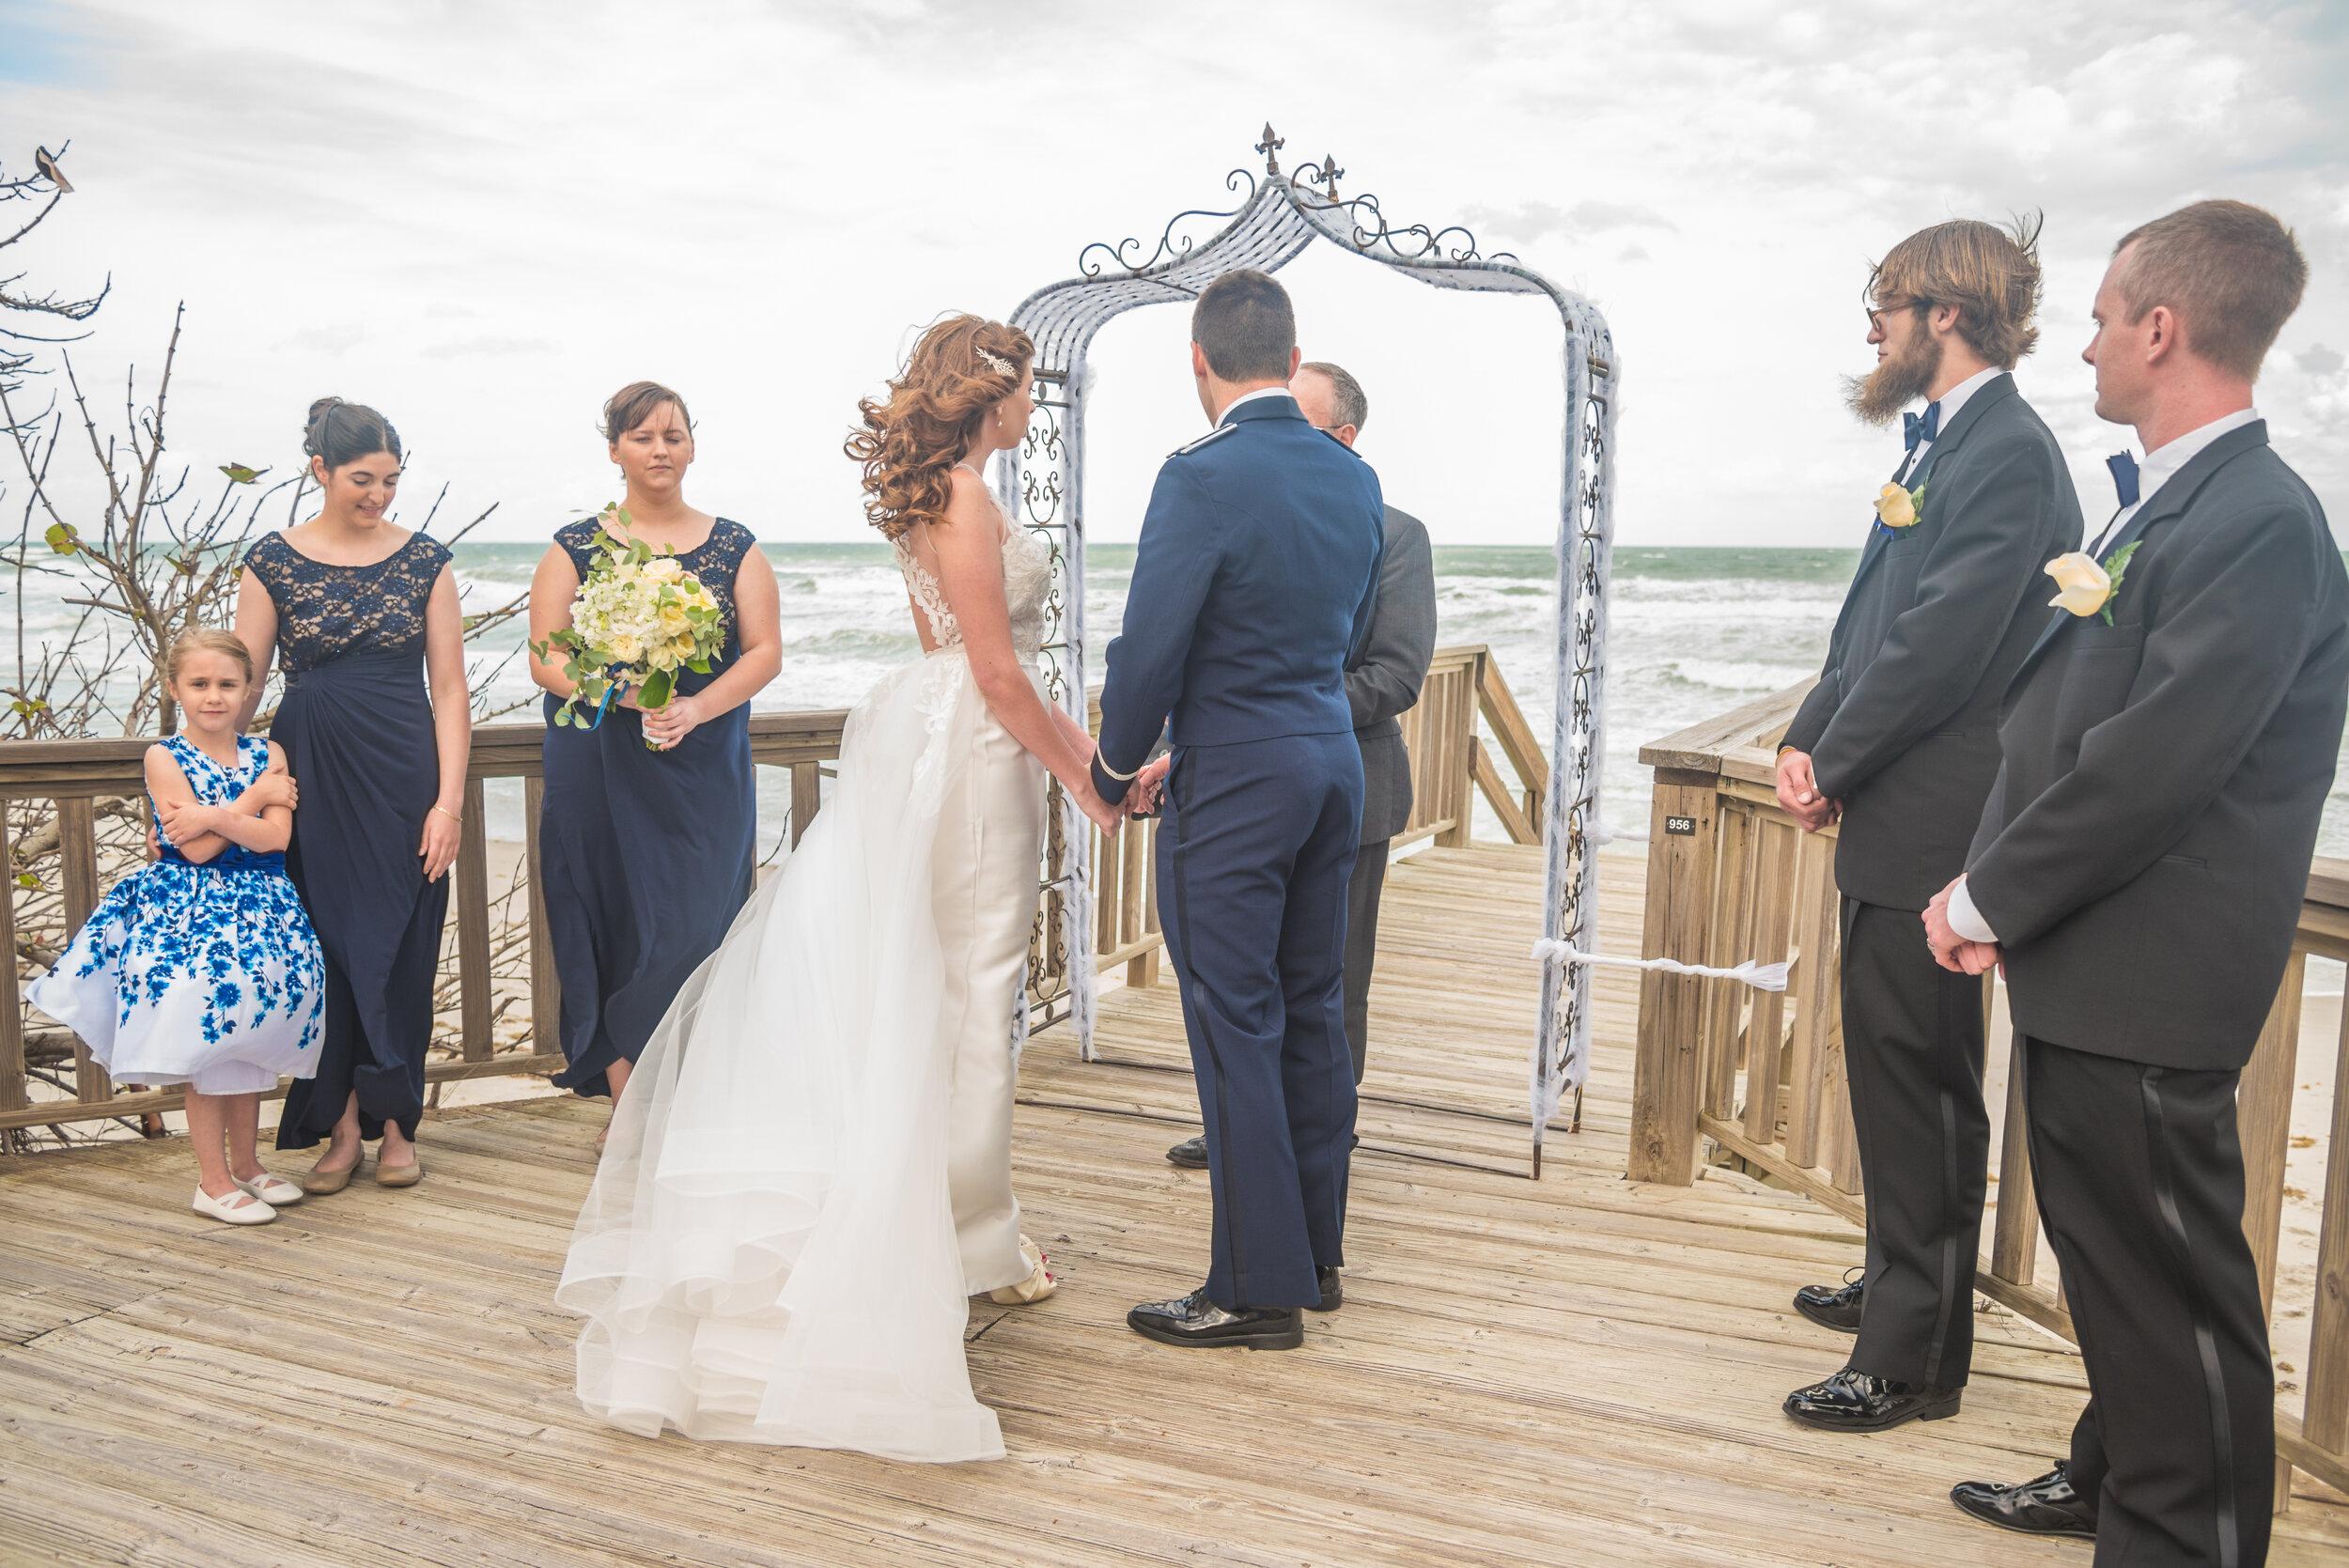 andru-the-tide-club-air-force-wedding-patrickafb-1-33.jpg